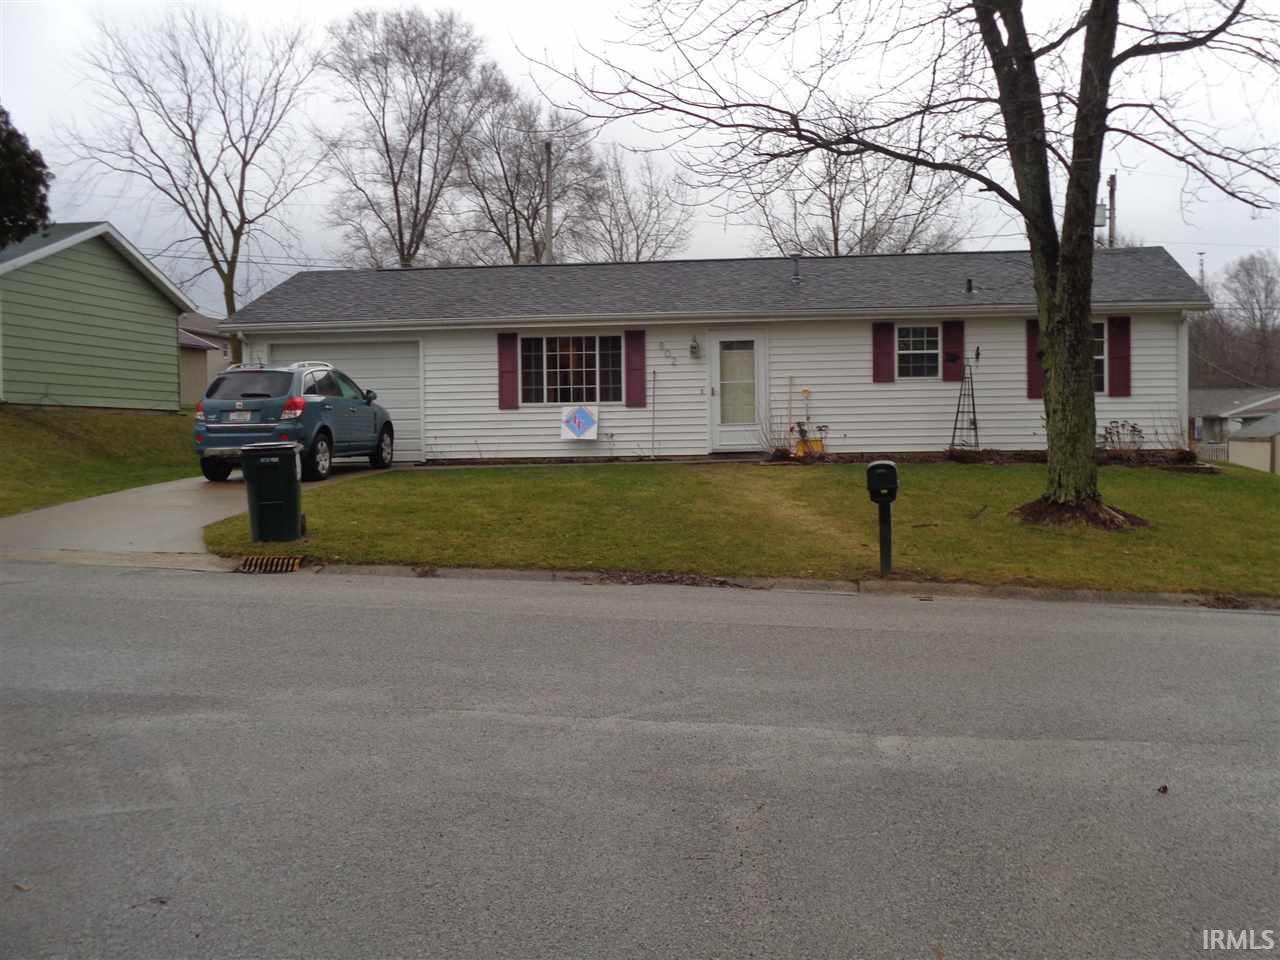 802 Pleasant Lane, Lagrange, IN 46761